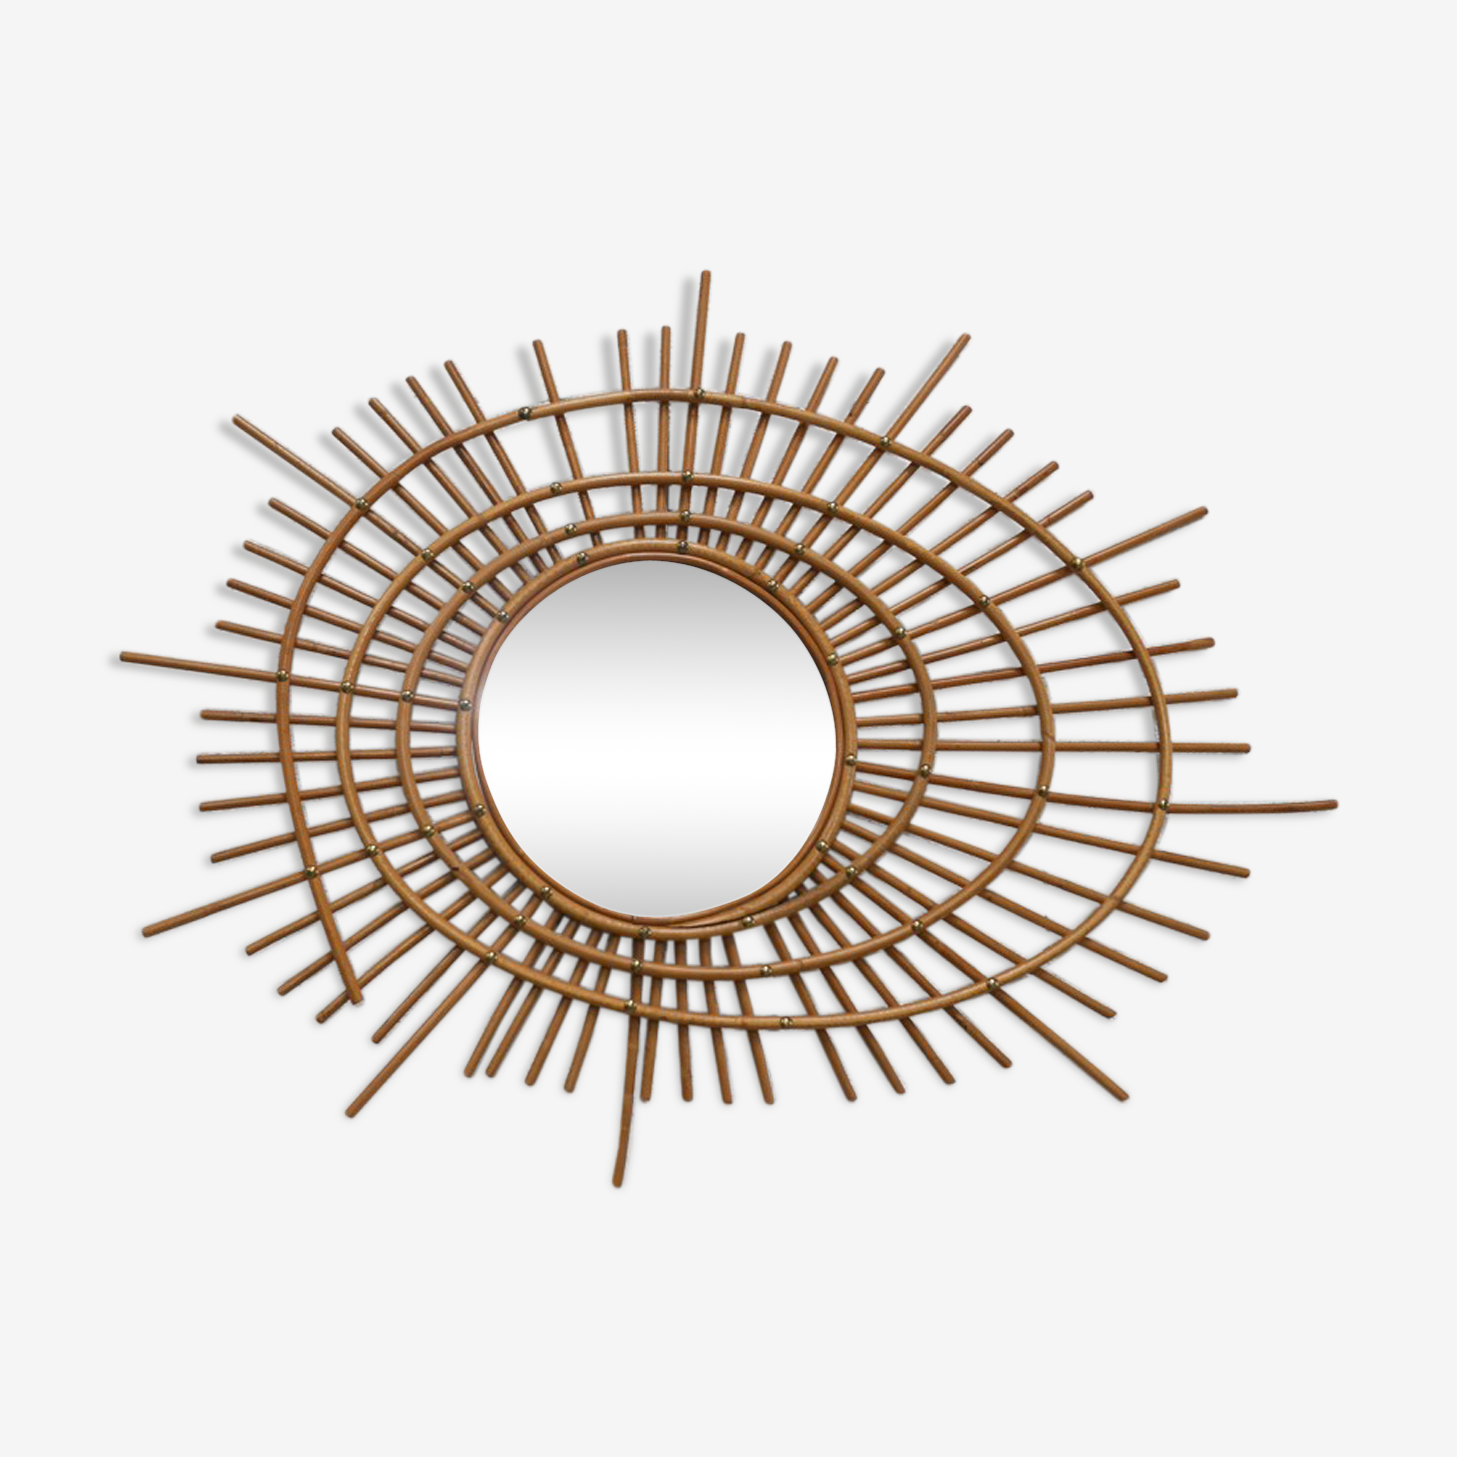 Miroir soleil spirale en rotin 78  x 65 cm